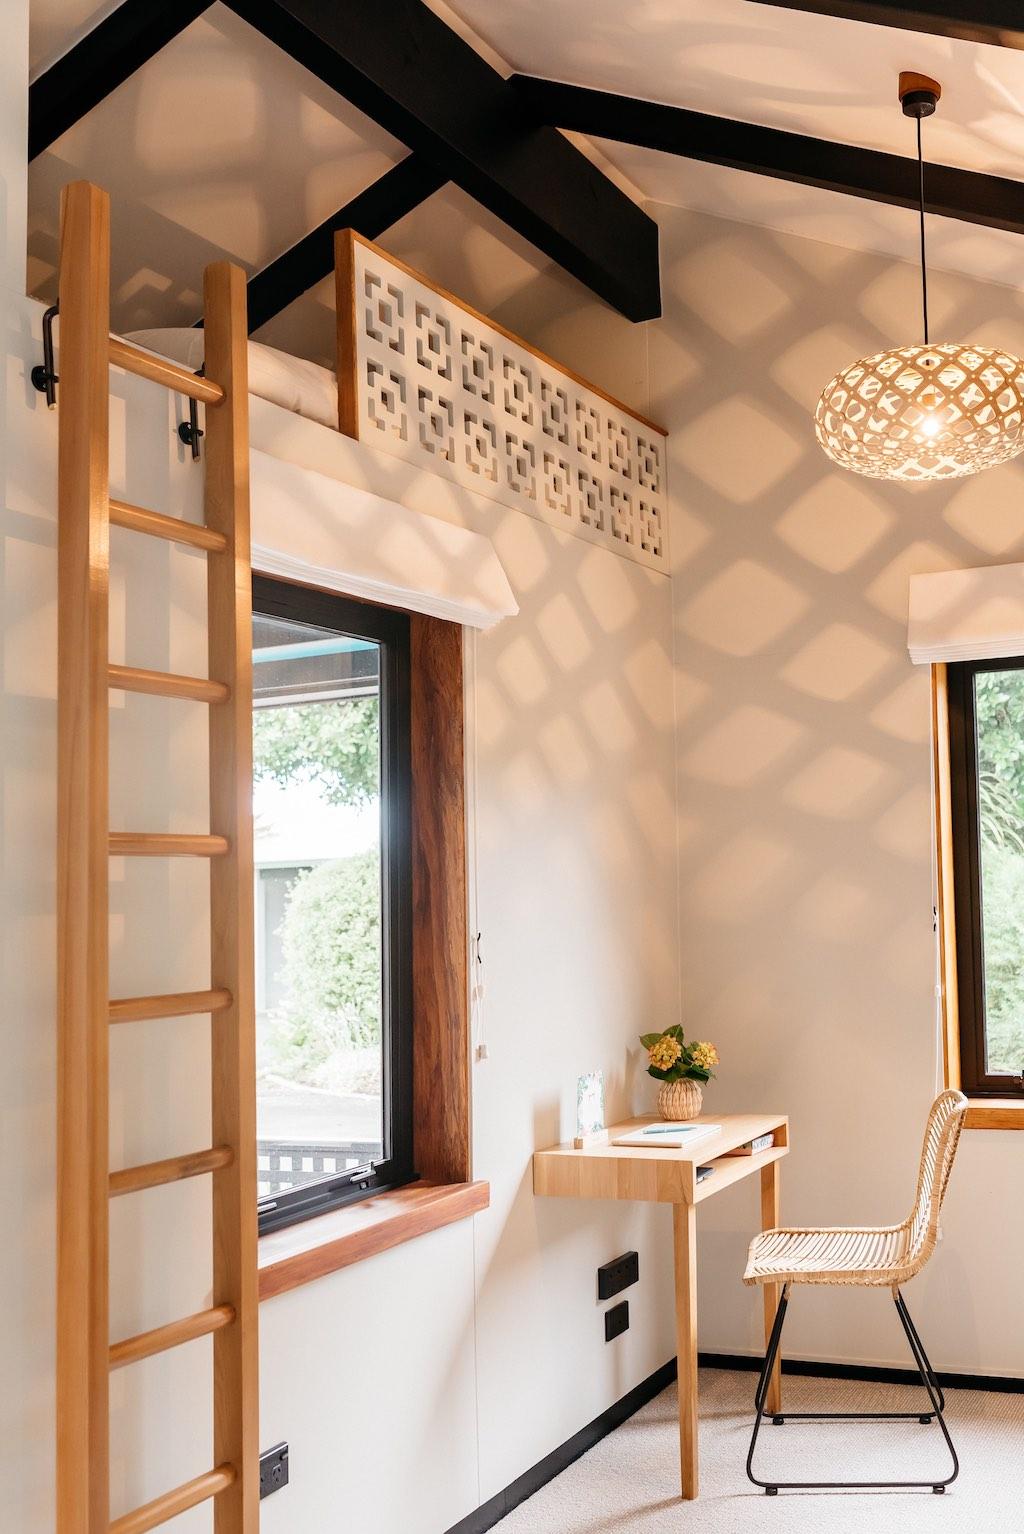 chambourcin-cottage-11